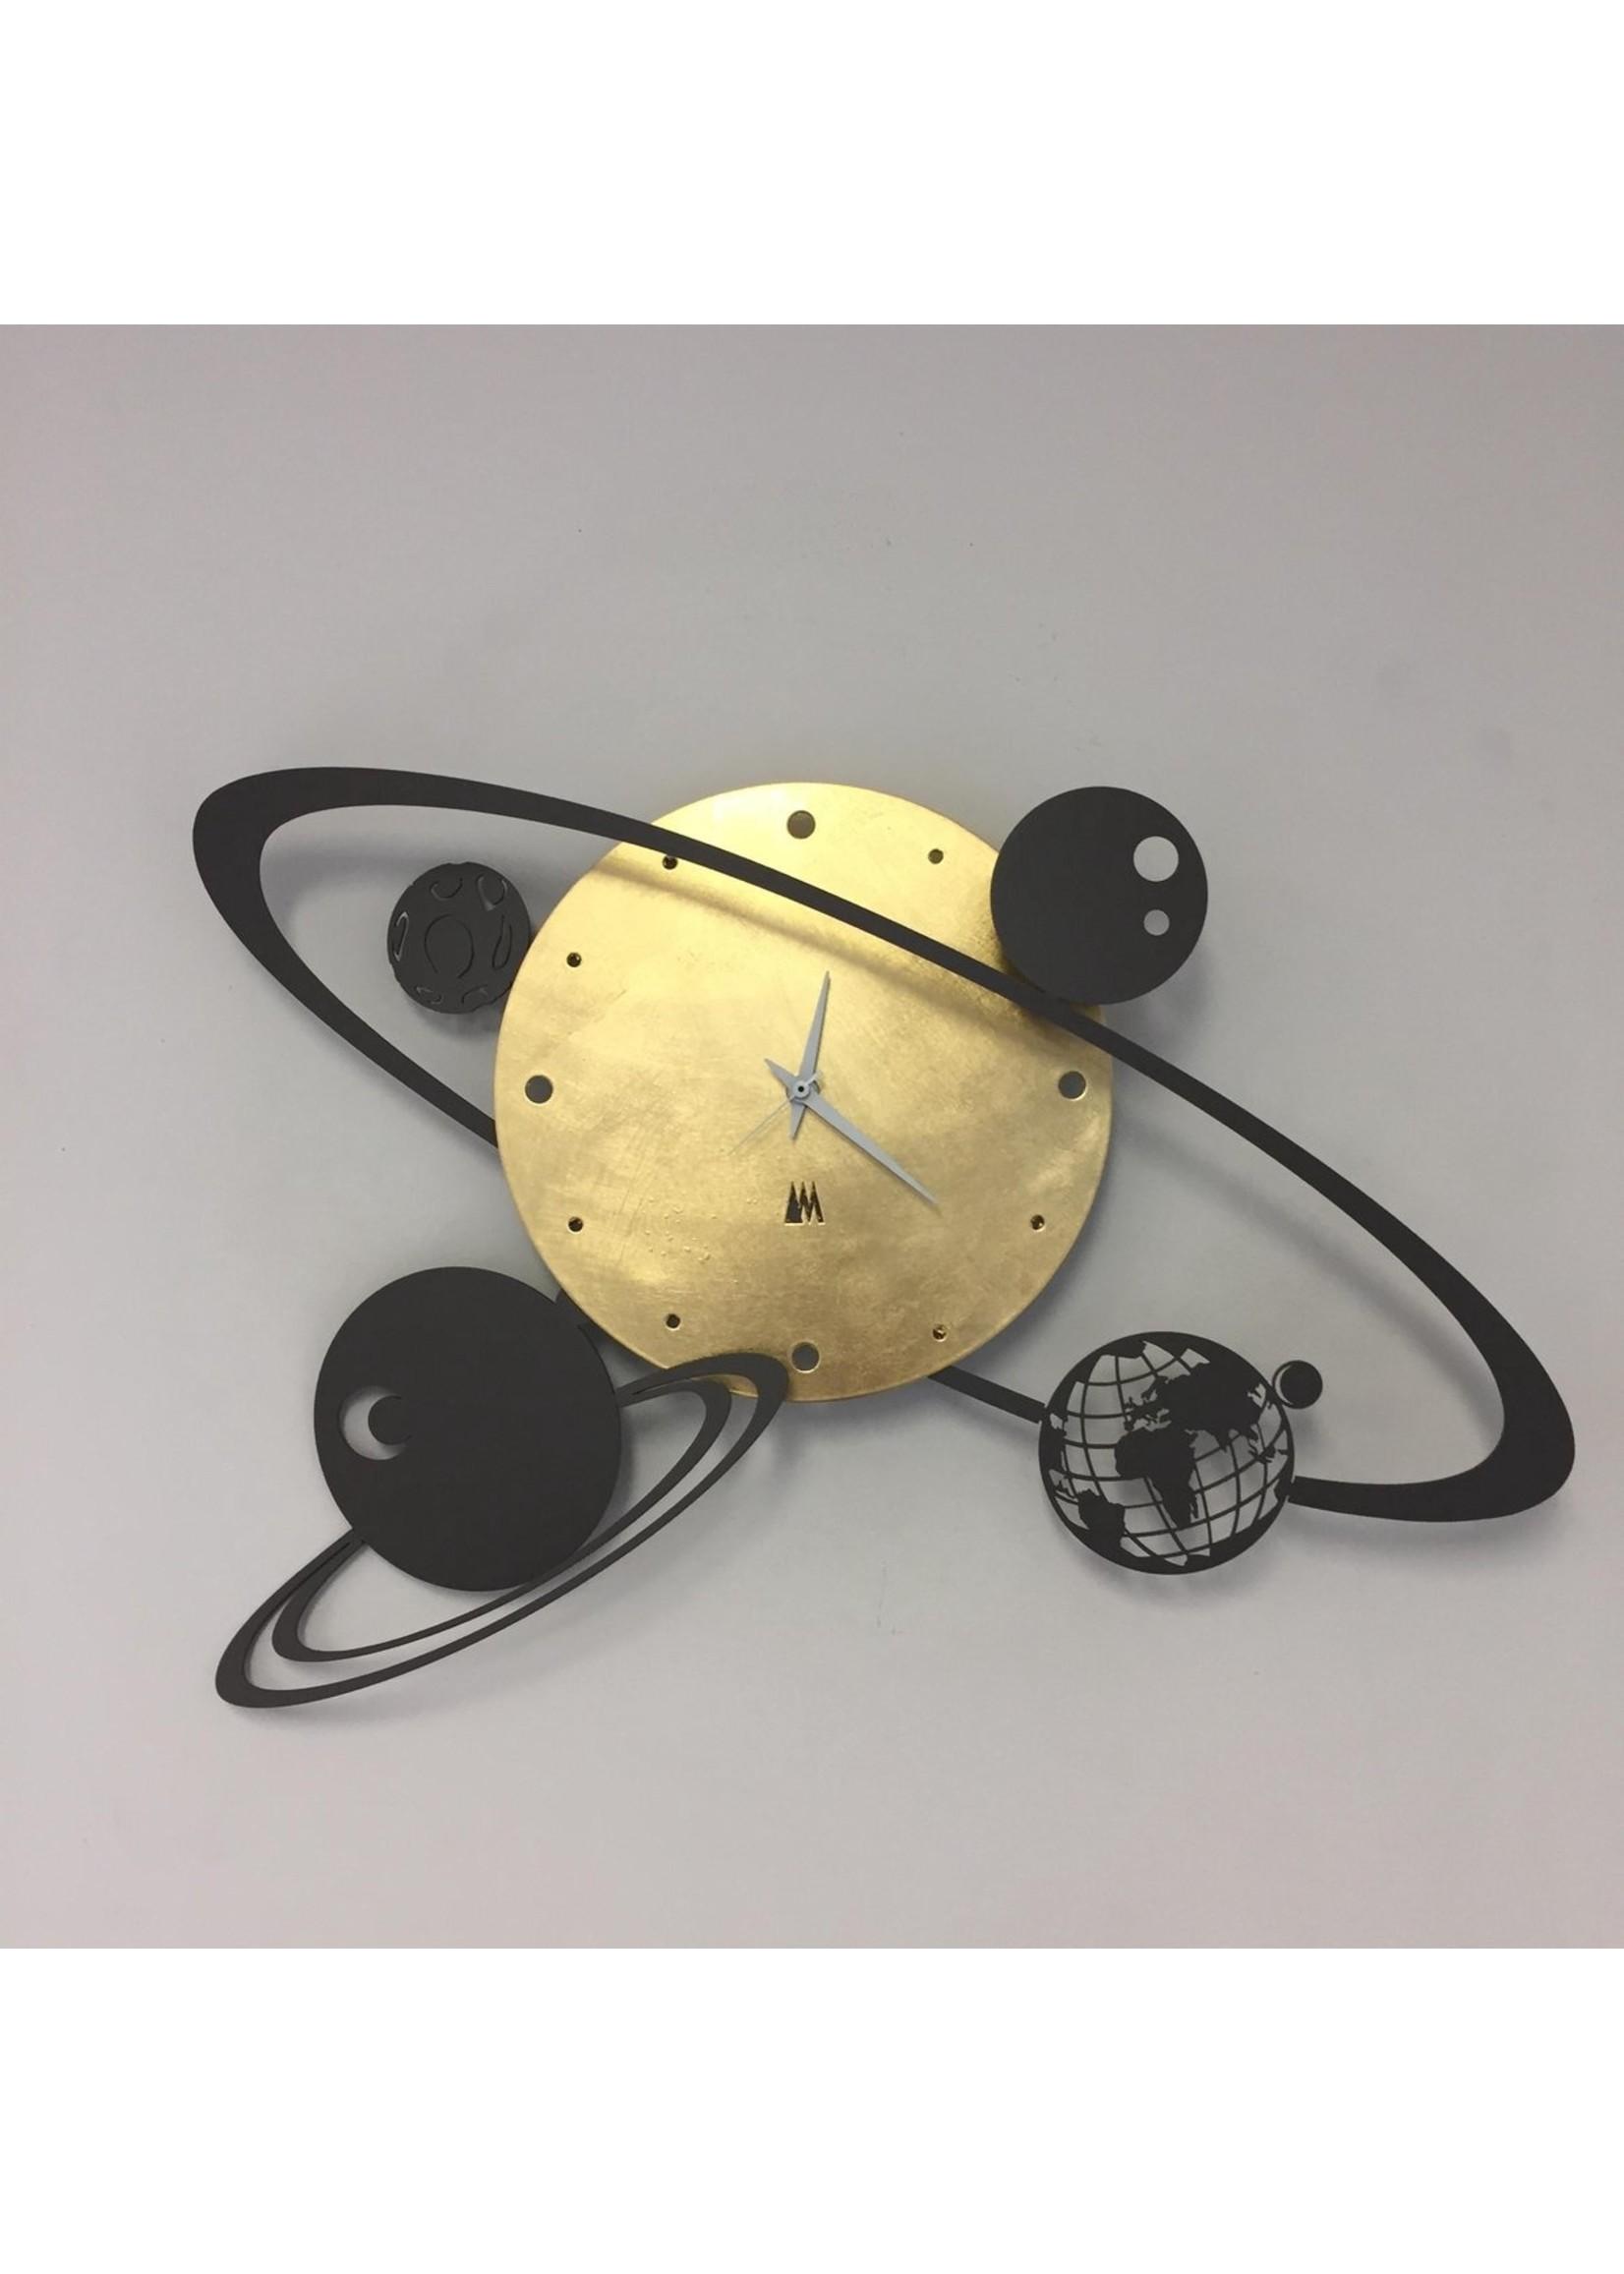 Arti & Mestieri A&M Collectie - Stil uurwerk – Handgemaakt – Metaal – 50 x 36cm - Wandklok MODERN ITALIAN DESIGN ZONNESTELSEL